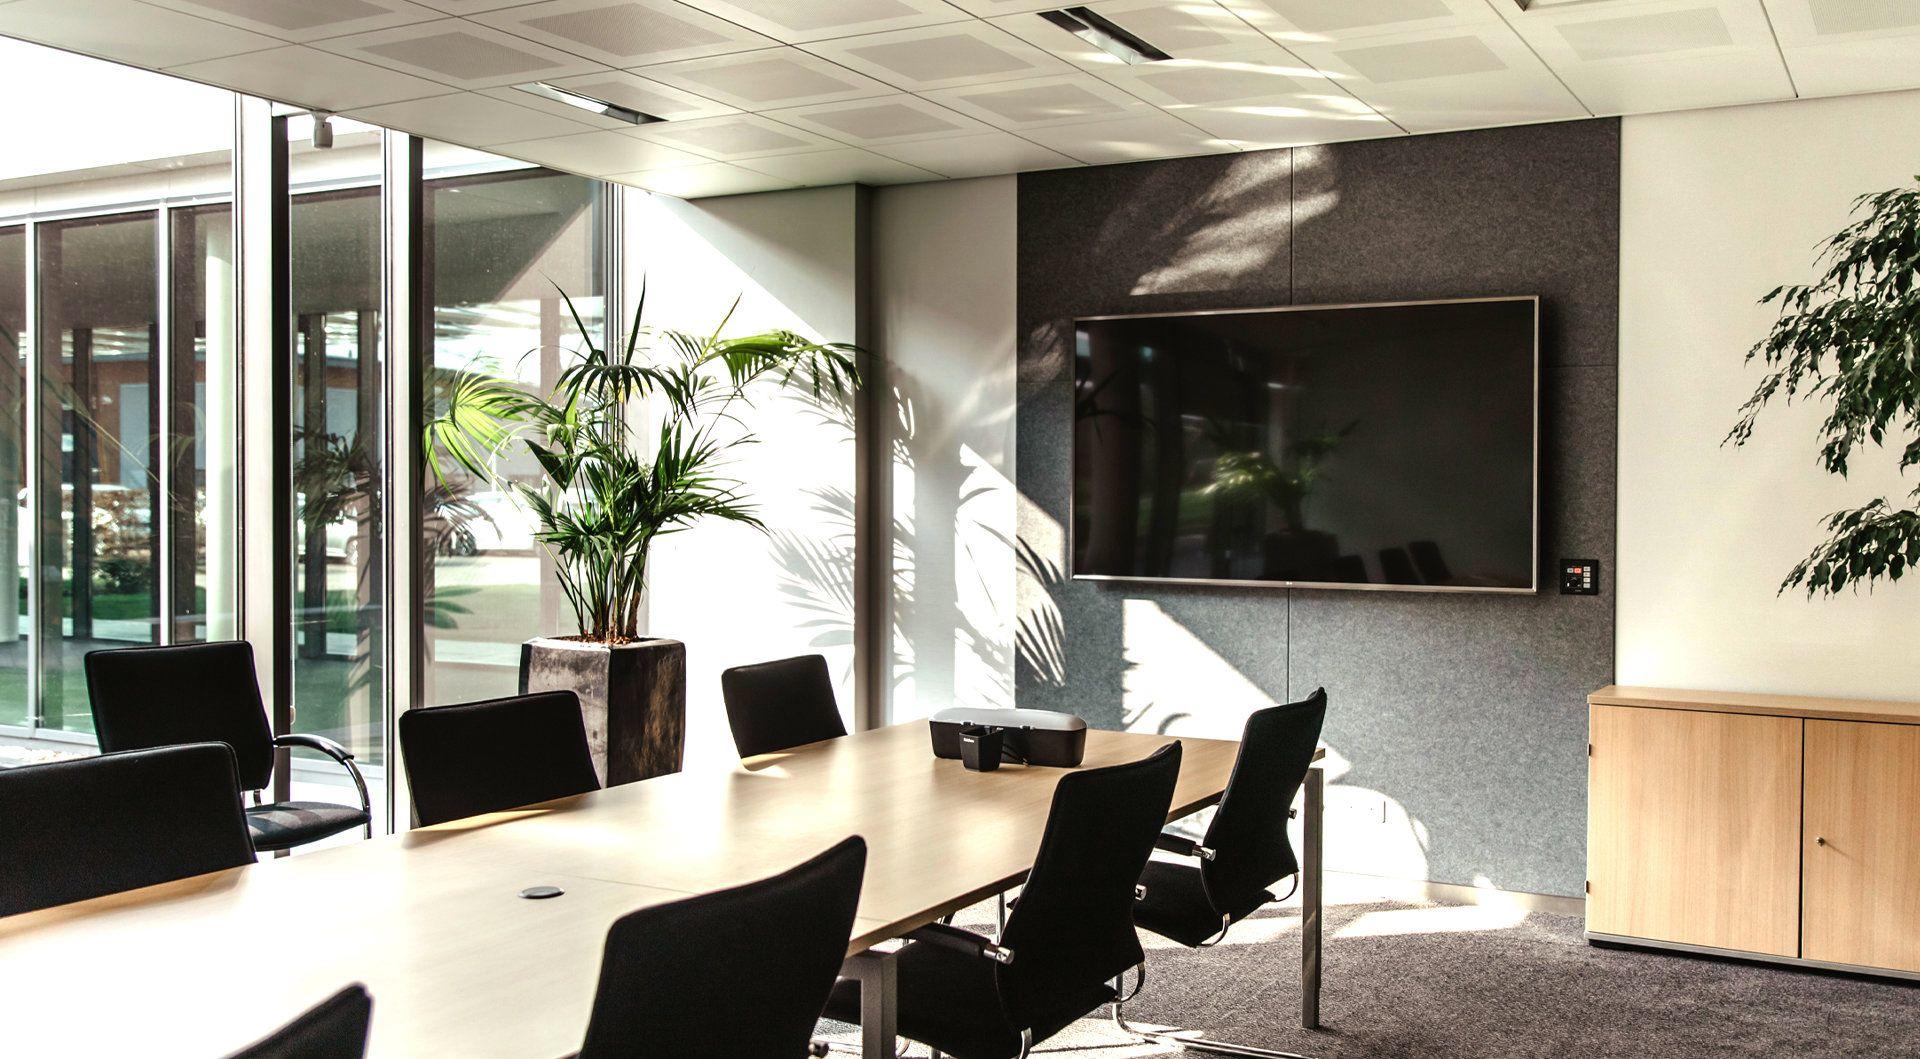 "LG 49XS2E beeldkrant 124,5 cm (49"") LED Full HD Digitale signage flatscreen Zwart - Case studie de vries"